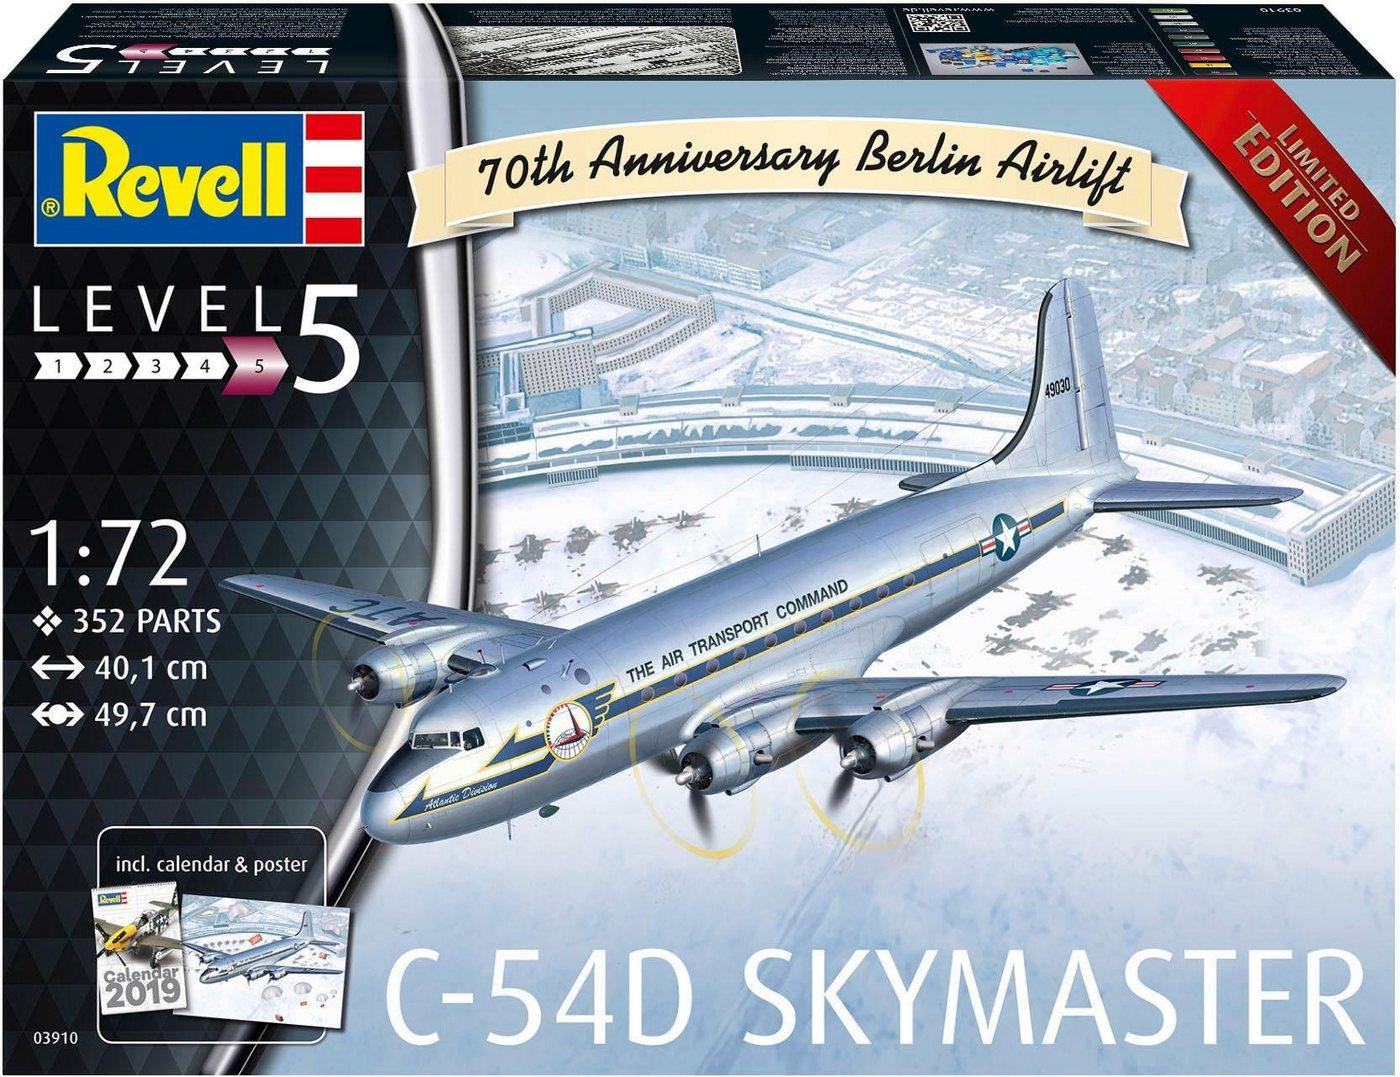 Revell Modellbausatz Flugzeug, 1:72, »C-54D Skymaster, Limited Edition-70 Jahre Berliner Luftbrücke«